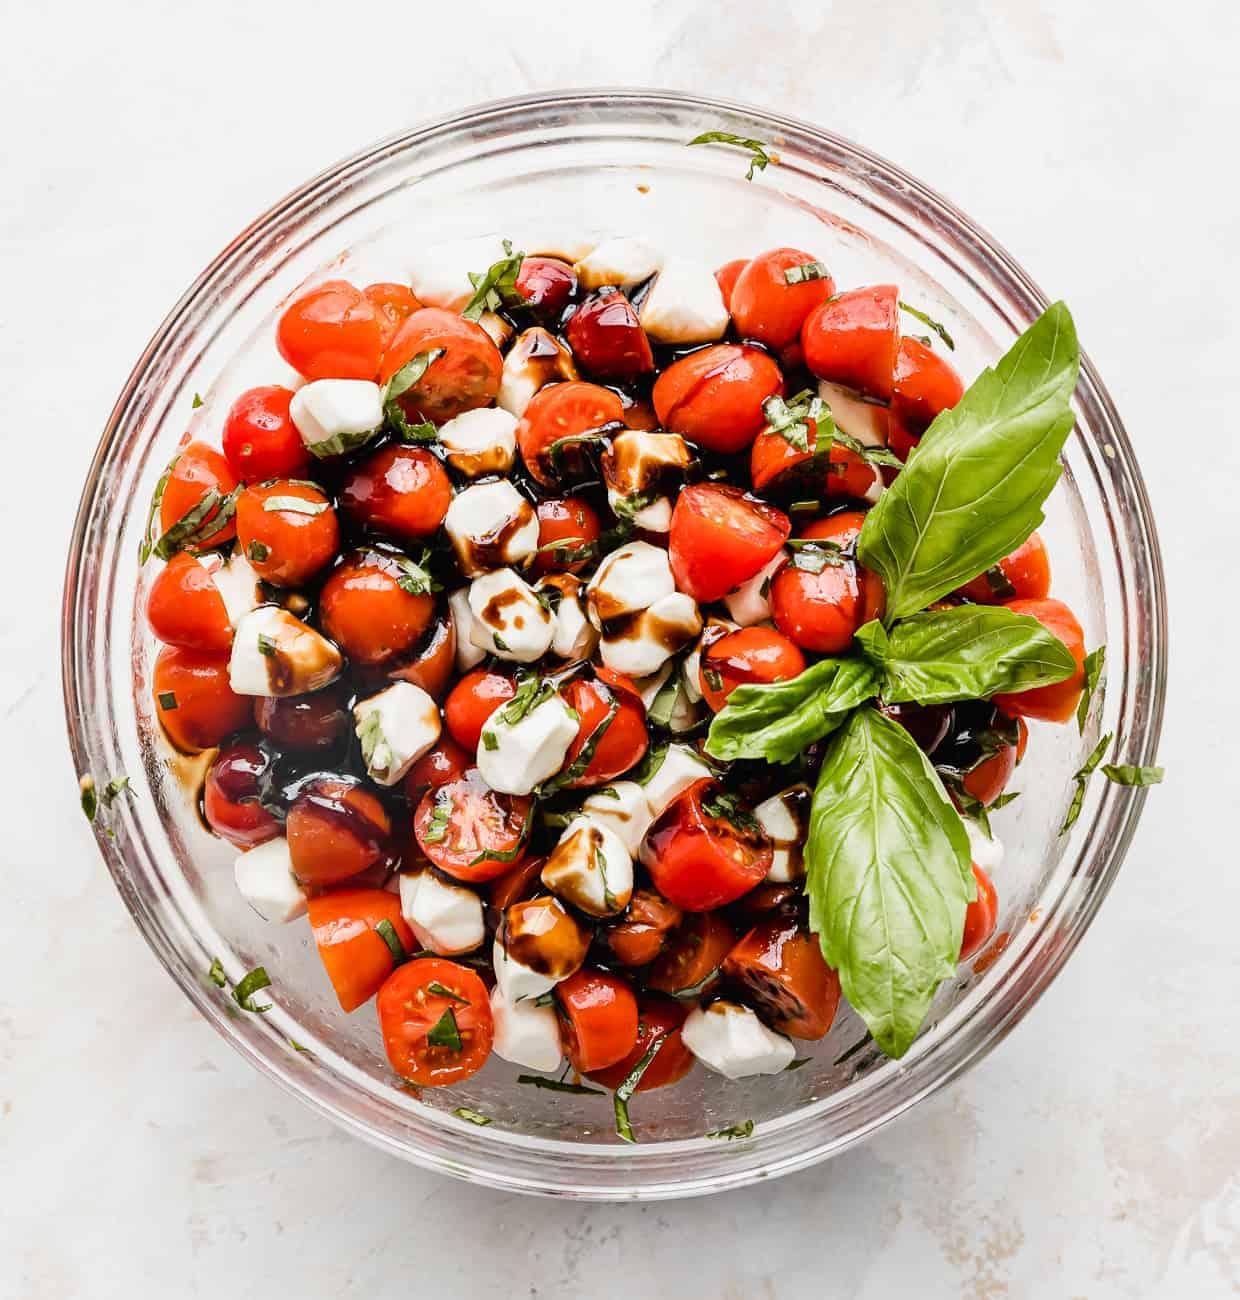 A cherry tomato caprese salad mixed with fresh mozzarella balls, fresh basil and a sprig of fresh basil on top.